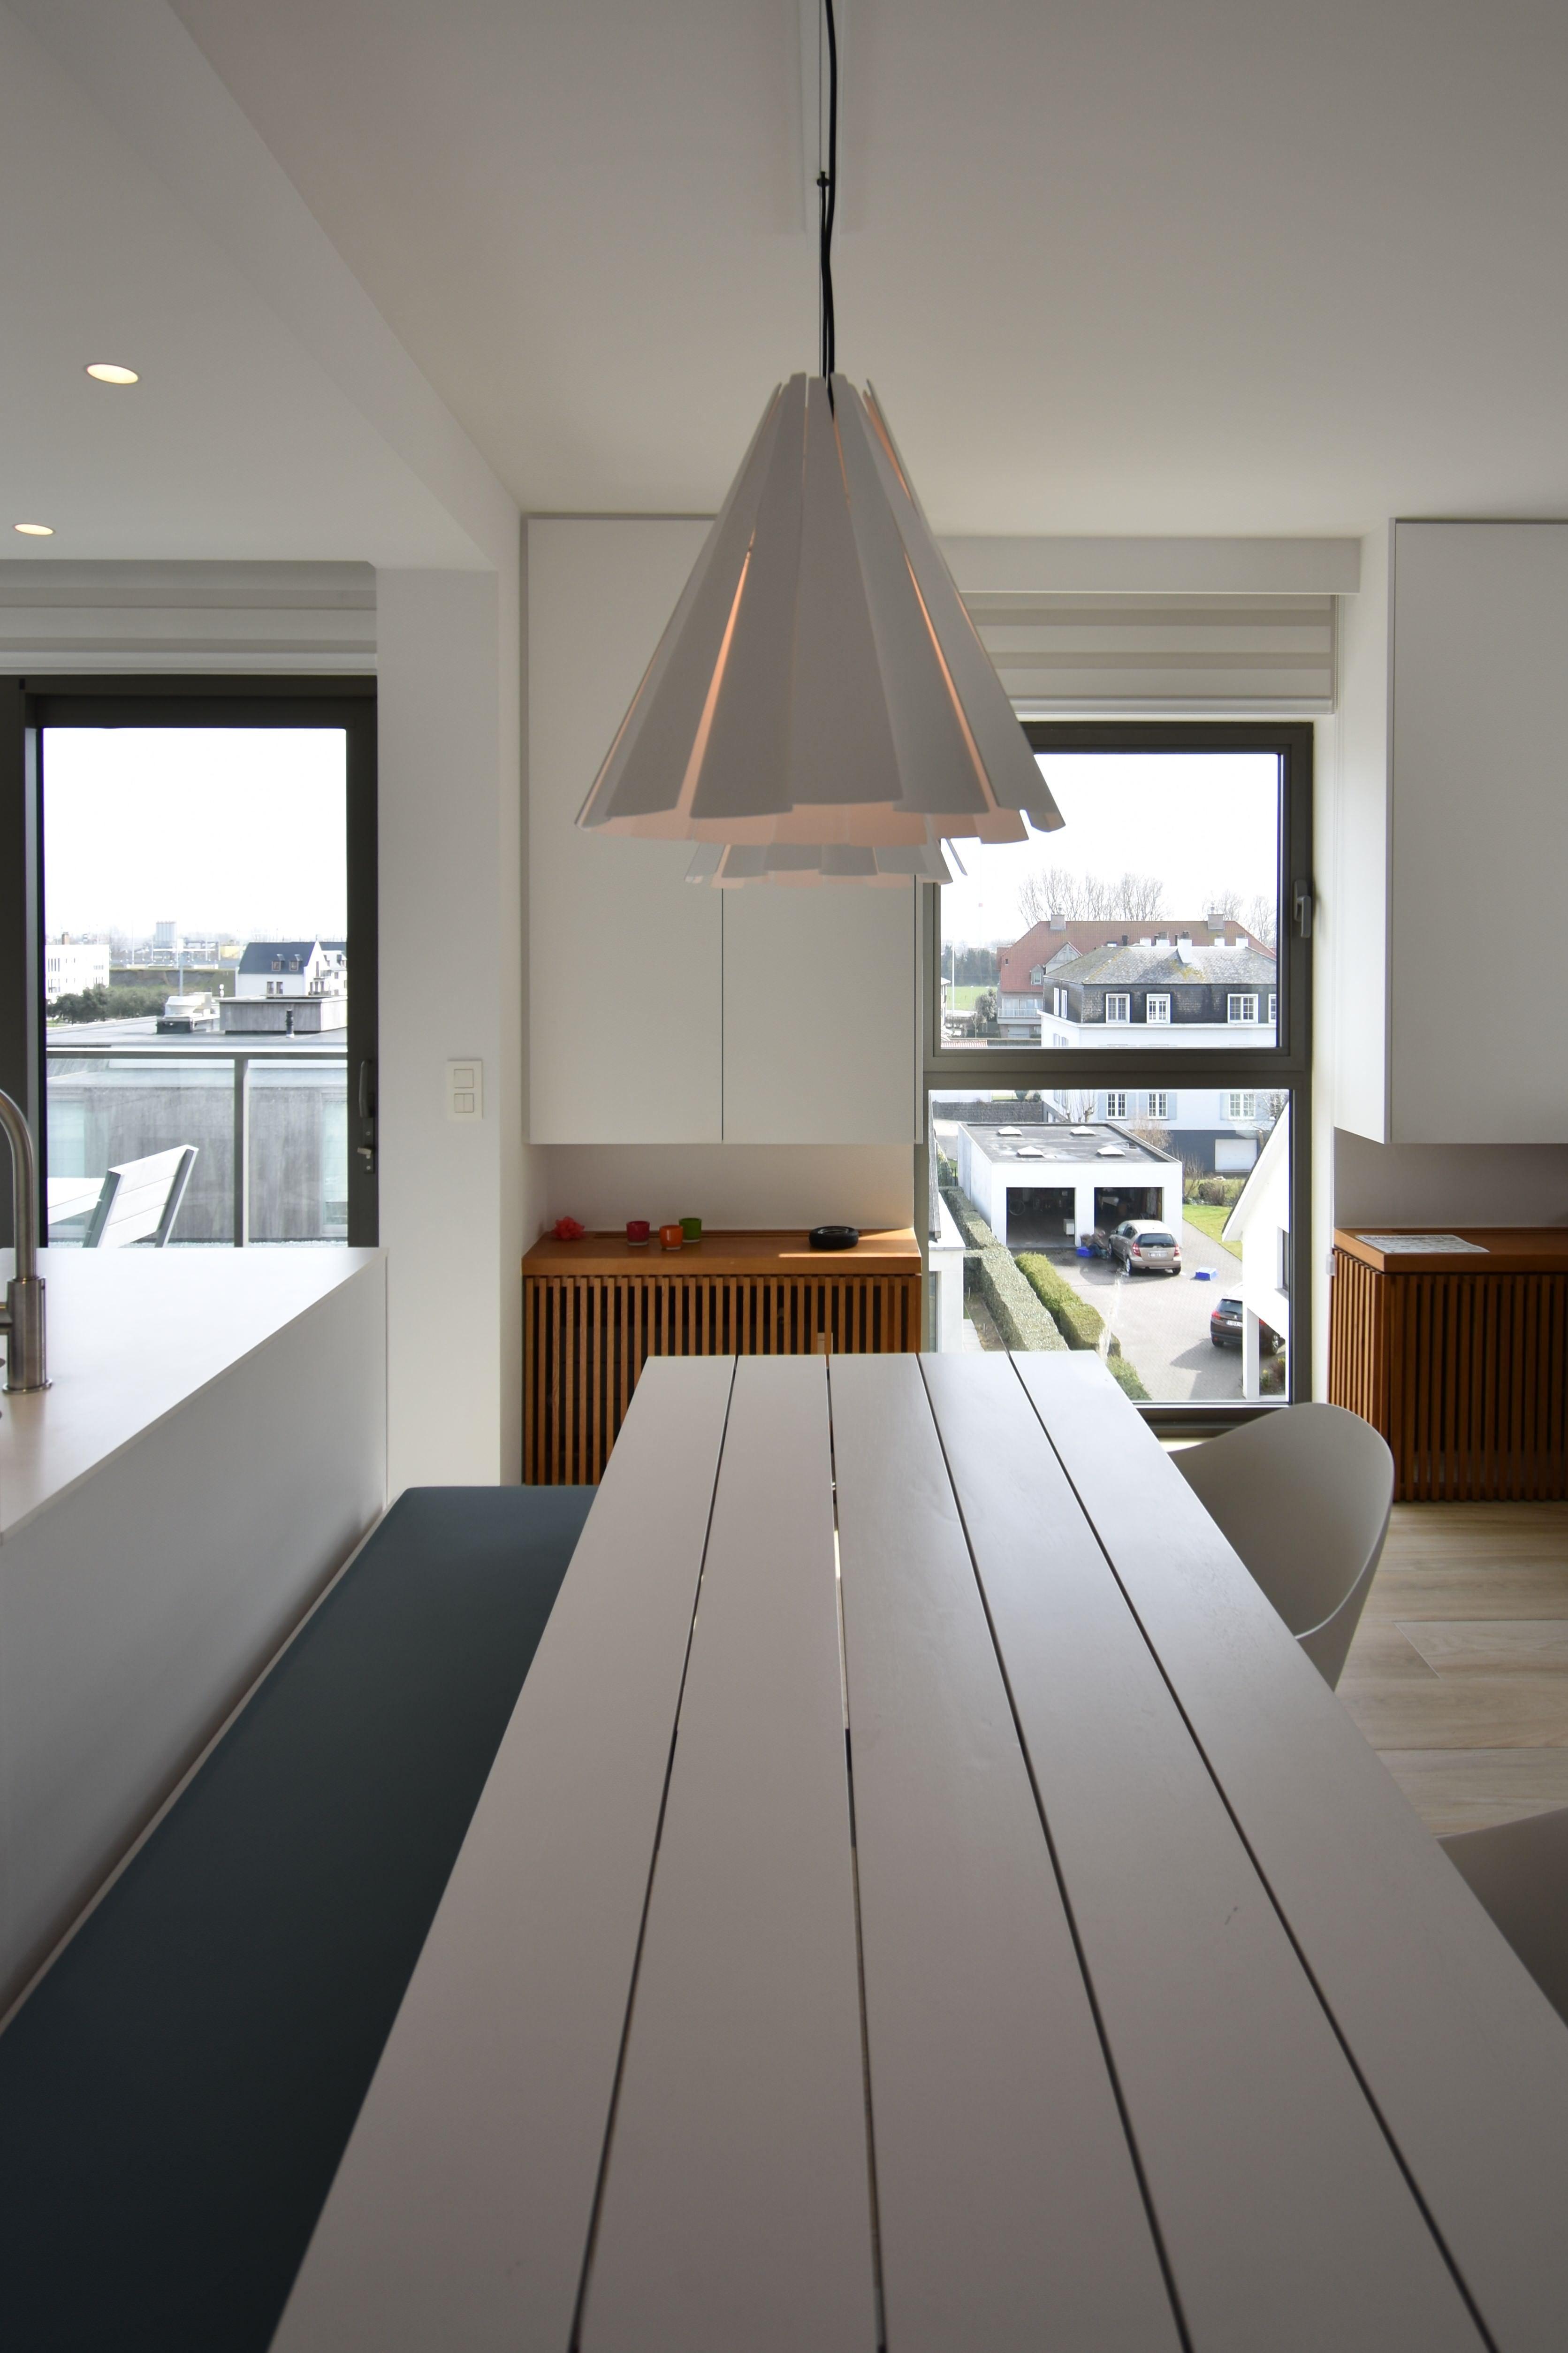 Interieurarchitecten West Vlaanderen - ARCHIDEV